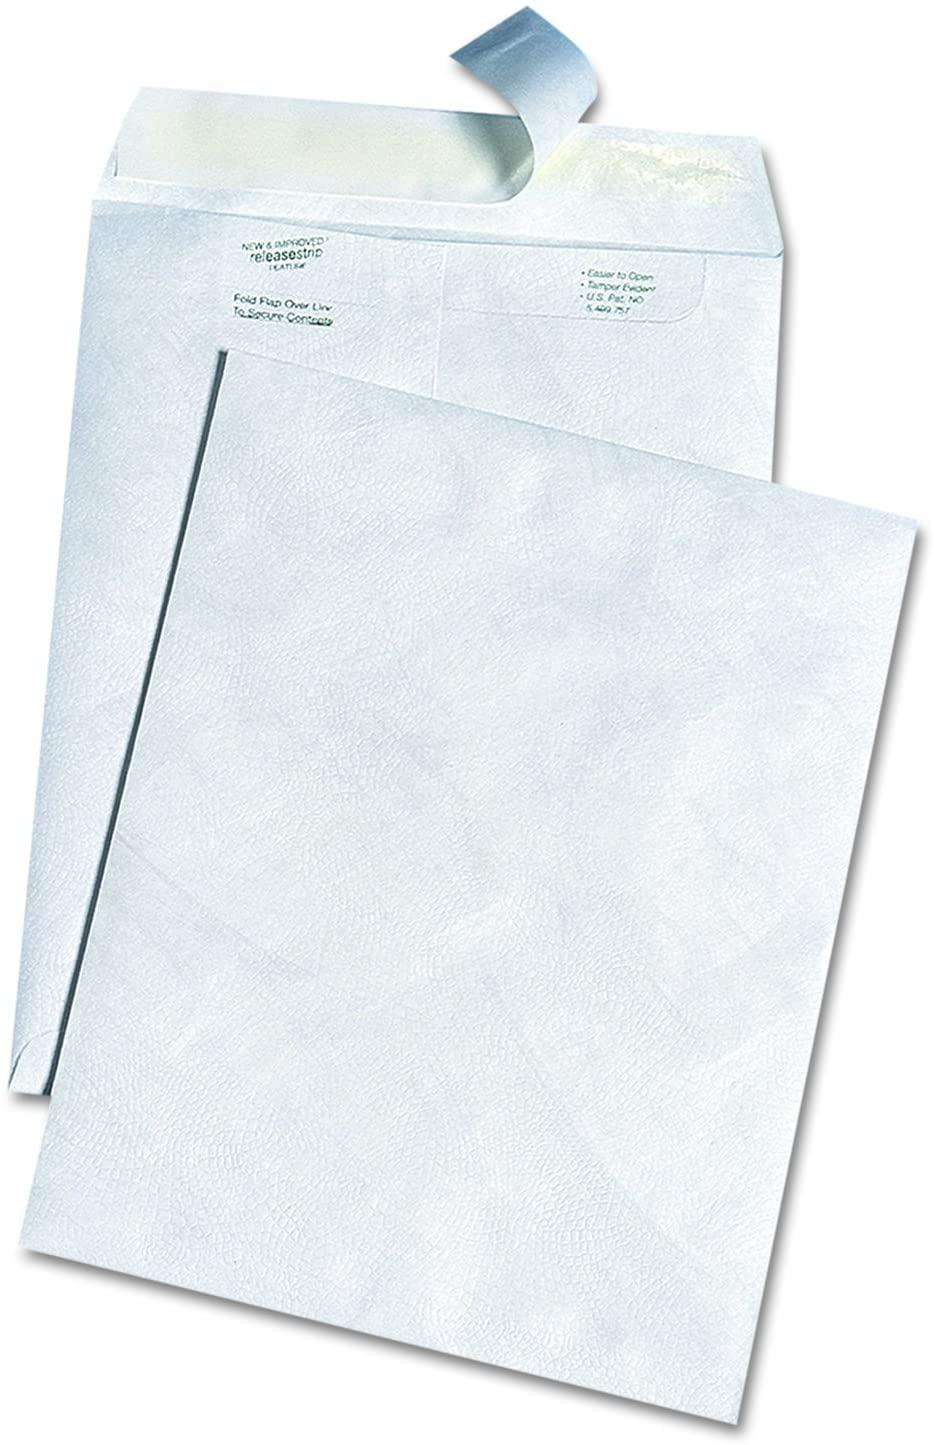 Survivor R3140 White Leather Tyvek Mailer, 10 x 13, White (Box of 100)